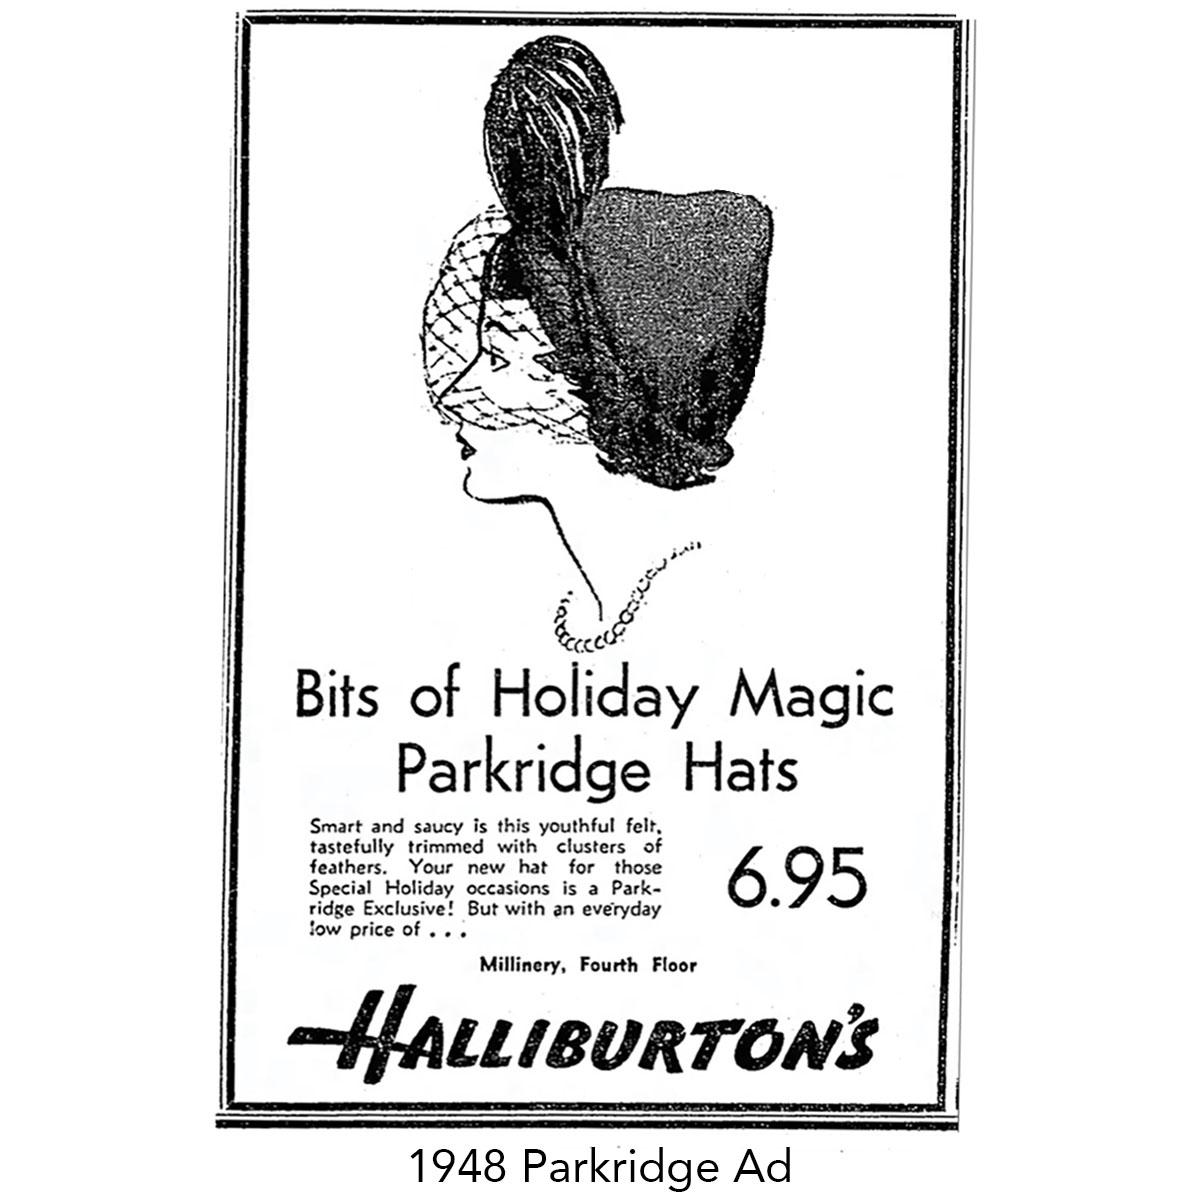 Parkridge hats advertisement from 1948